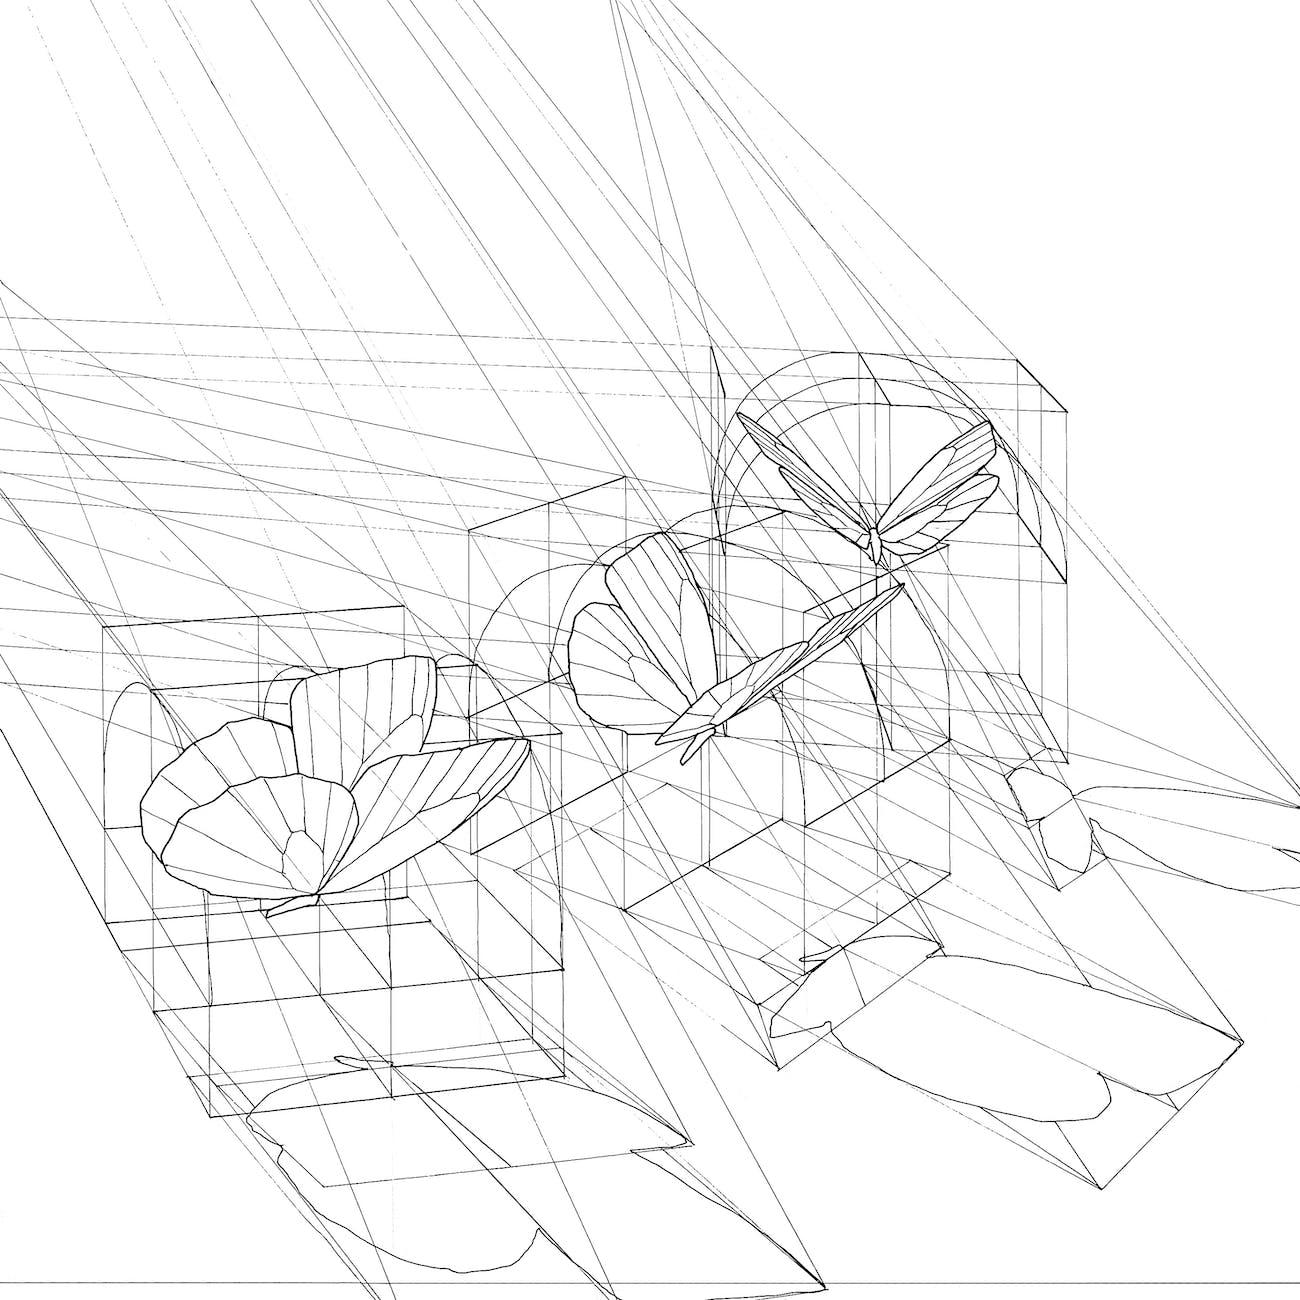 Rafael Araujo Draws Perfect Illustrations By Hand Using